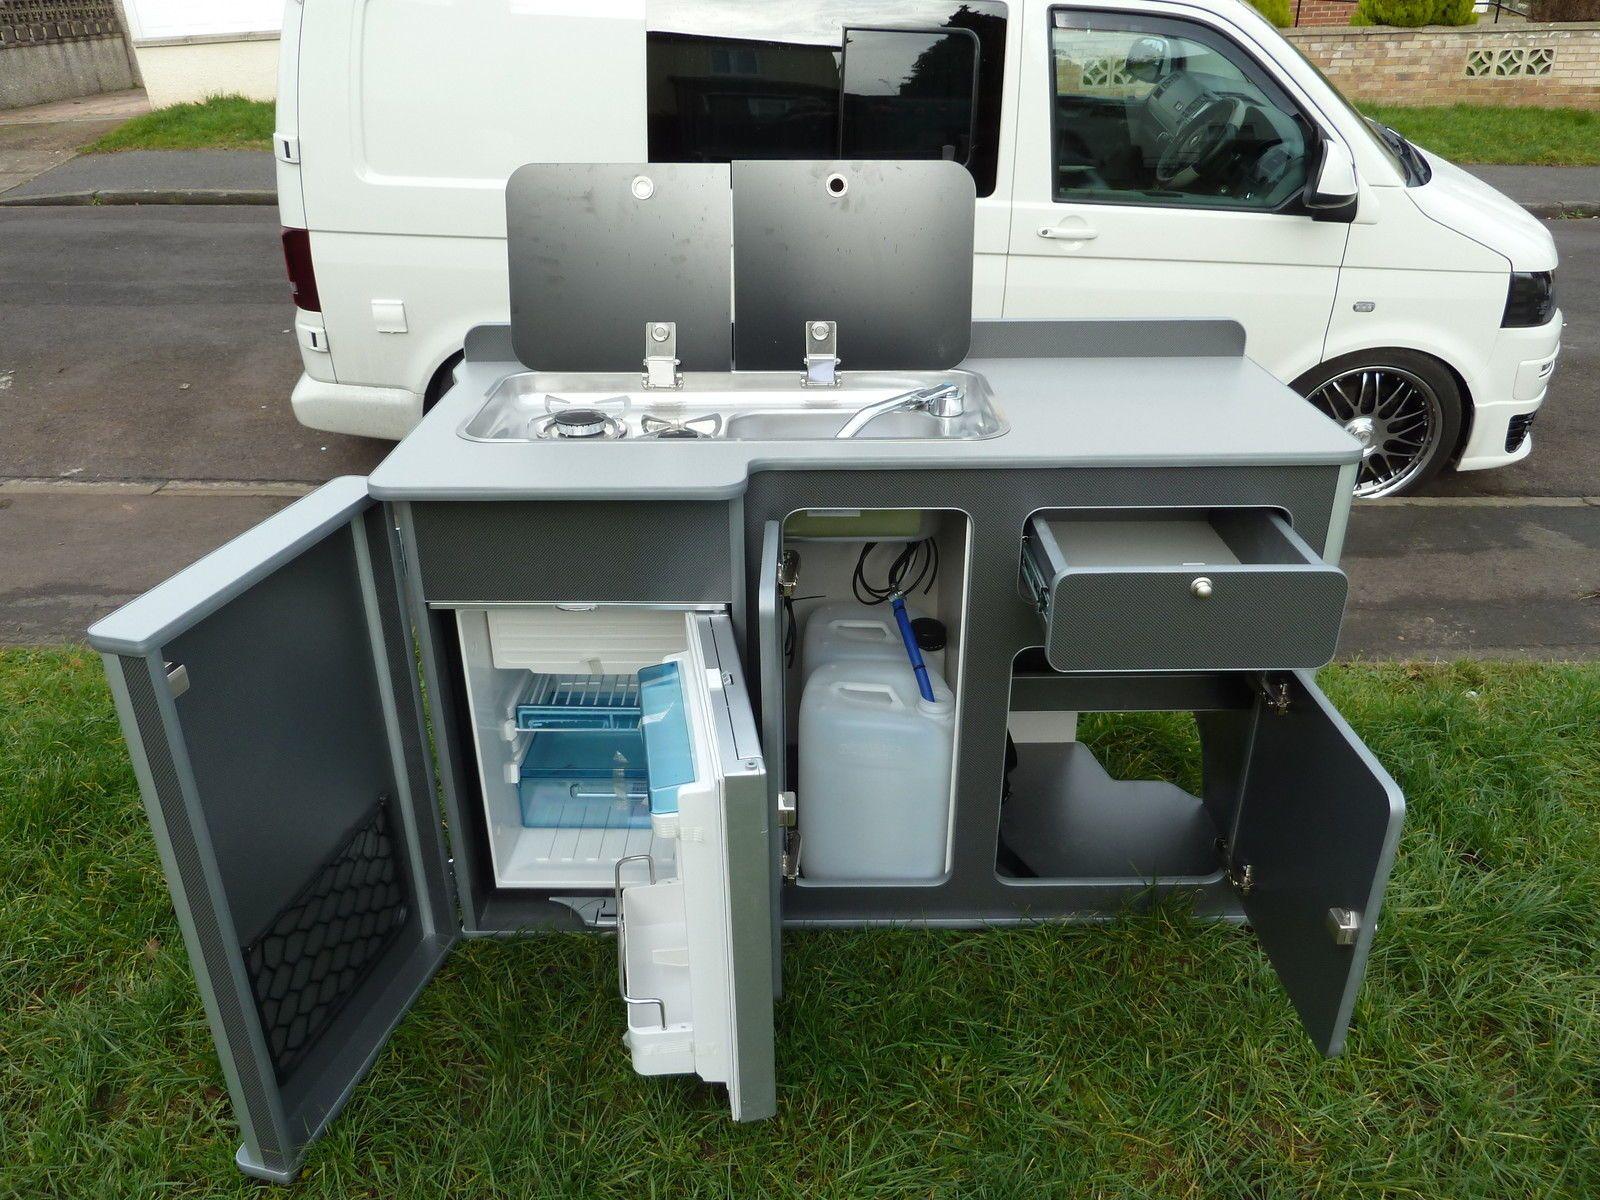 Vw T5 Kitchen Pod With Waeco Cr 50 Fridge Camper Van Kitchen Camper Van Conversion Diy Camper Conversion